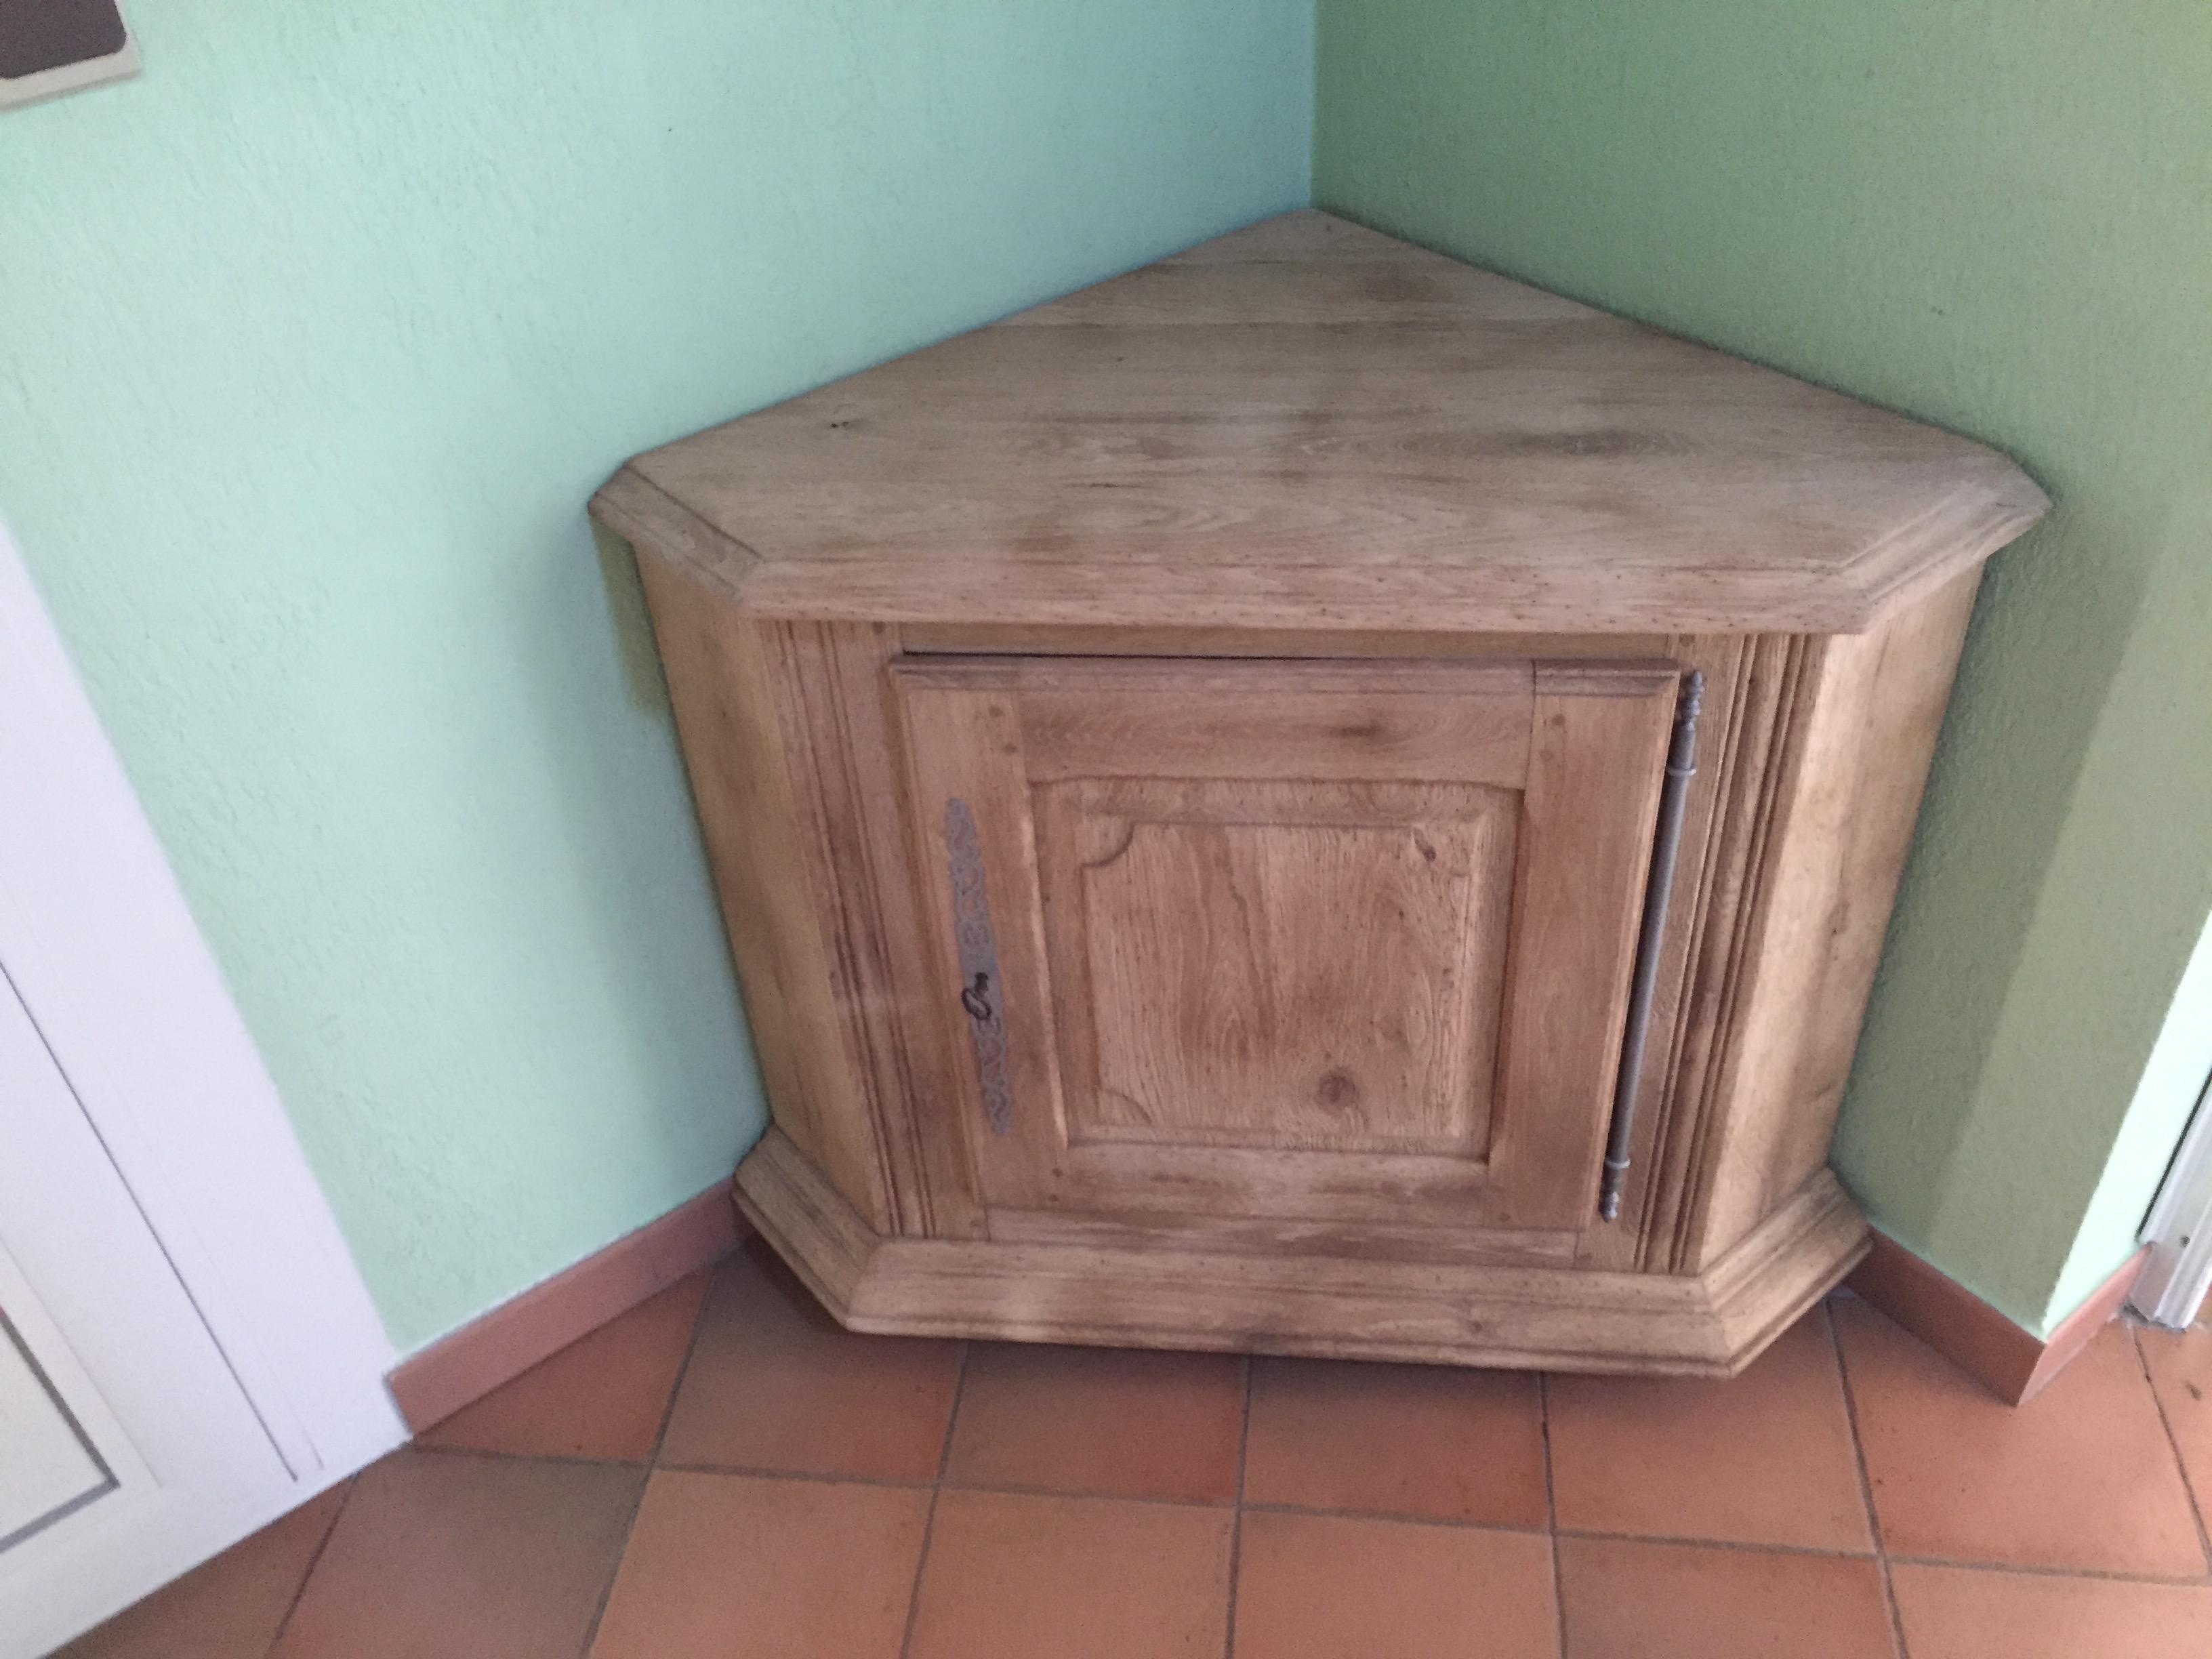 sablage de meubles aix en provence ttc. Black Bedroom Furniture Sets. Home Design Ideas